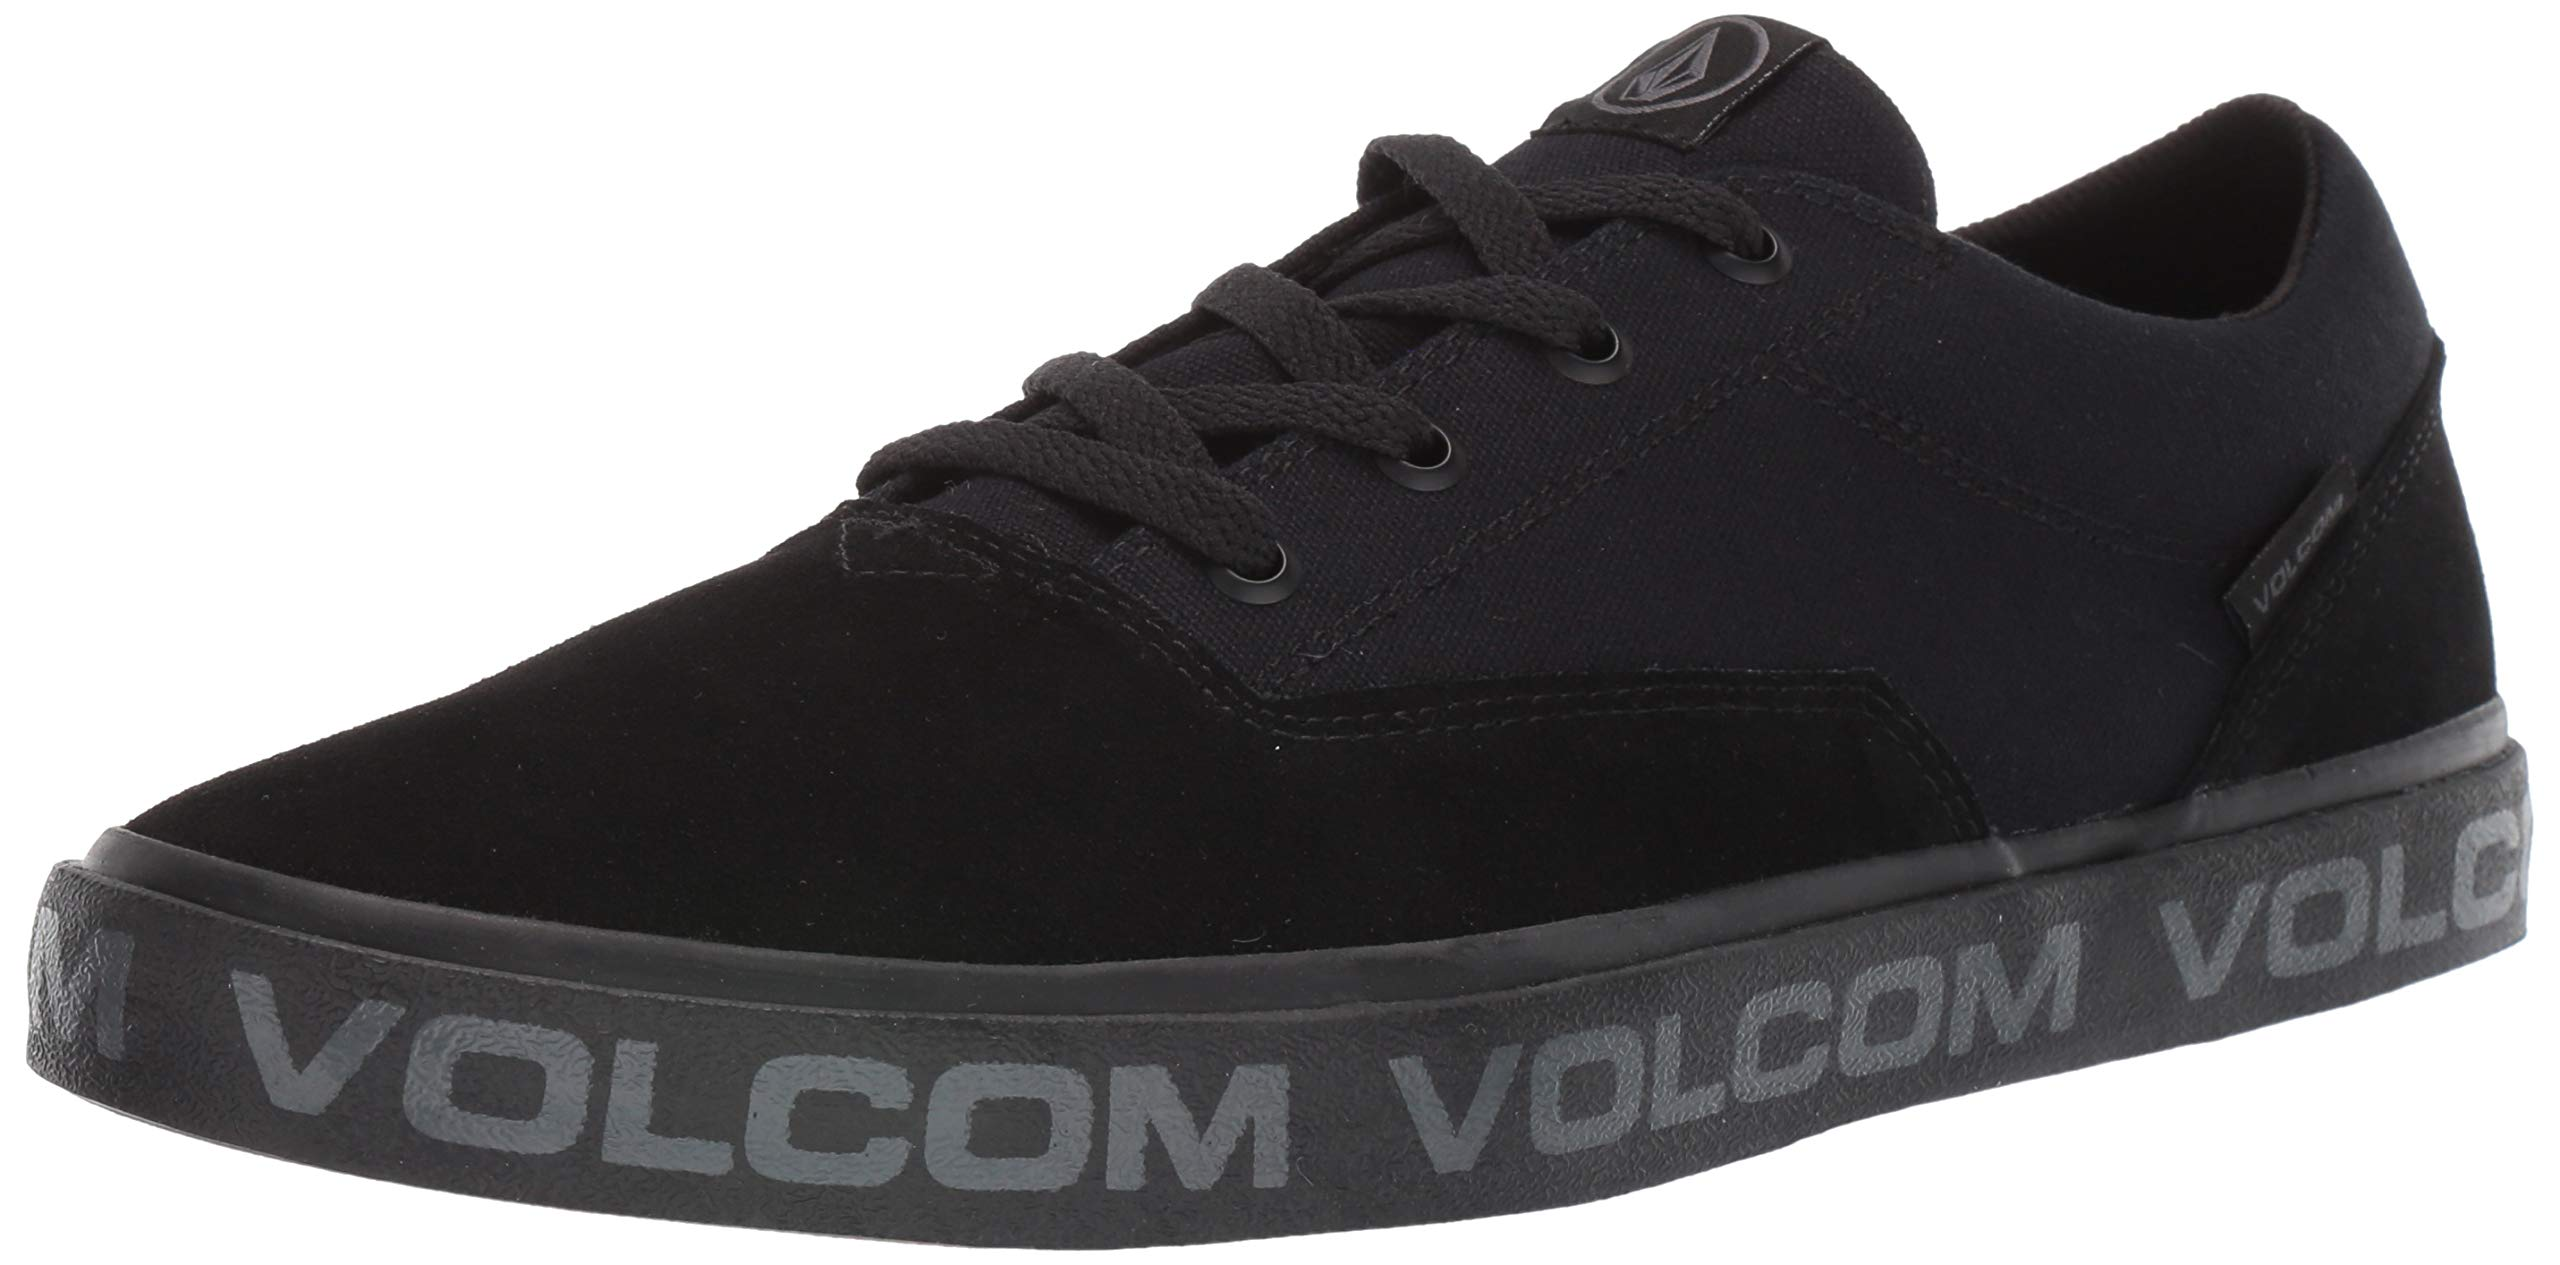 Volcom Men's Draw LO Suede Shoe Skate, BLACKITY Black, 8 D US by Volcom